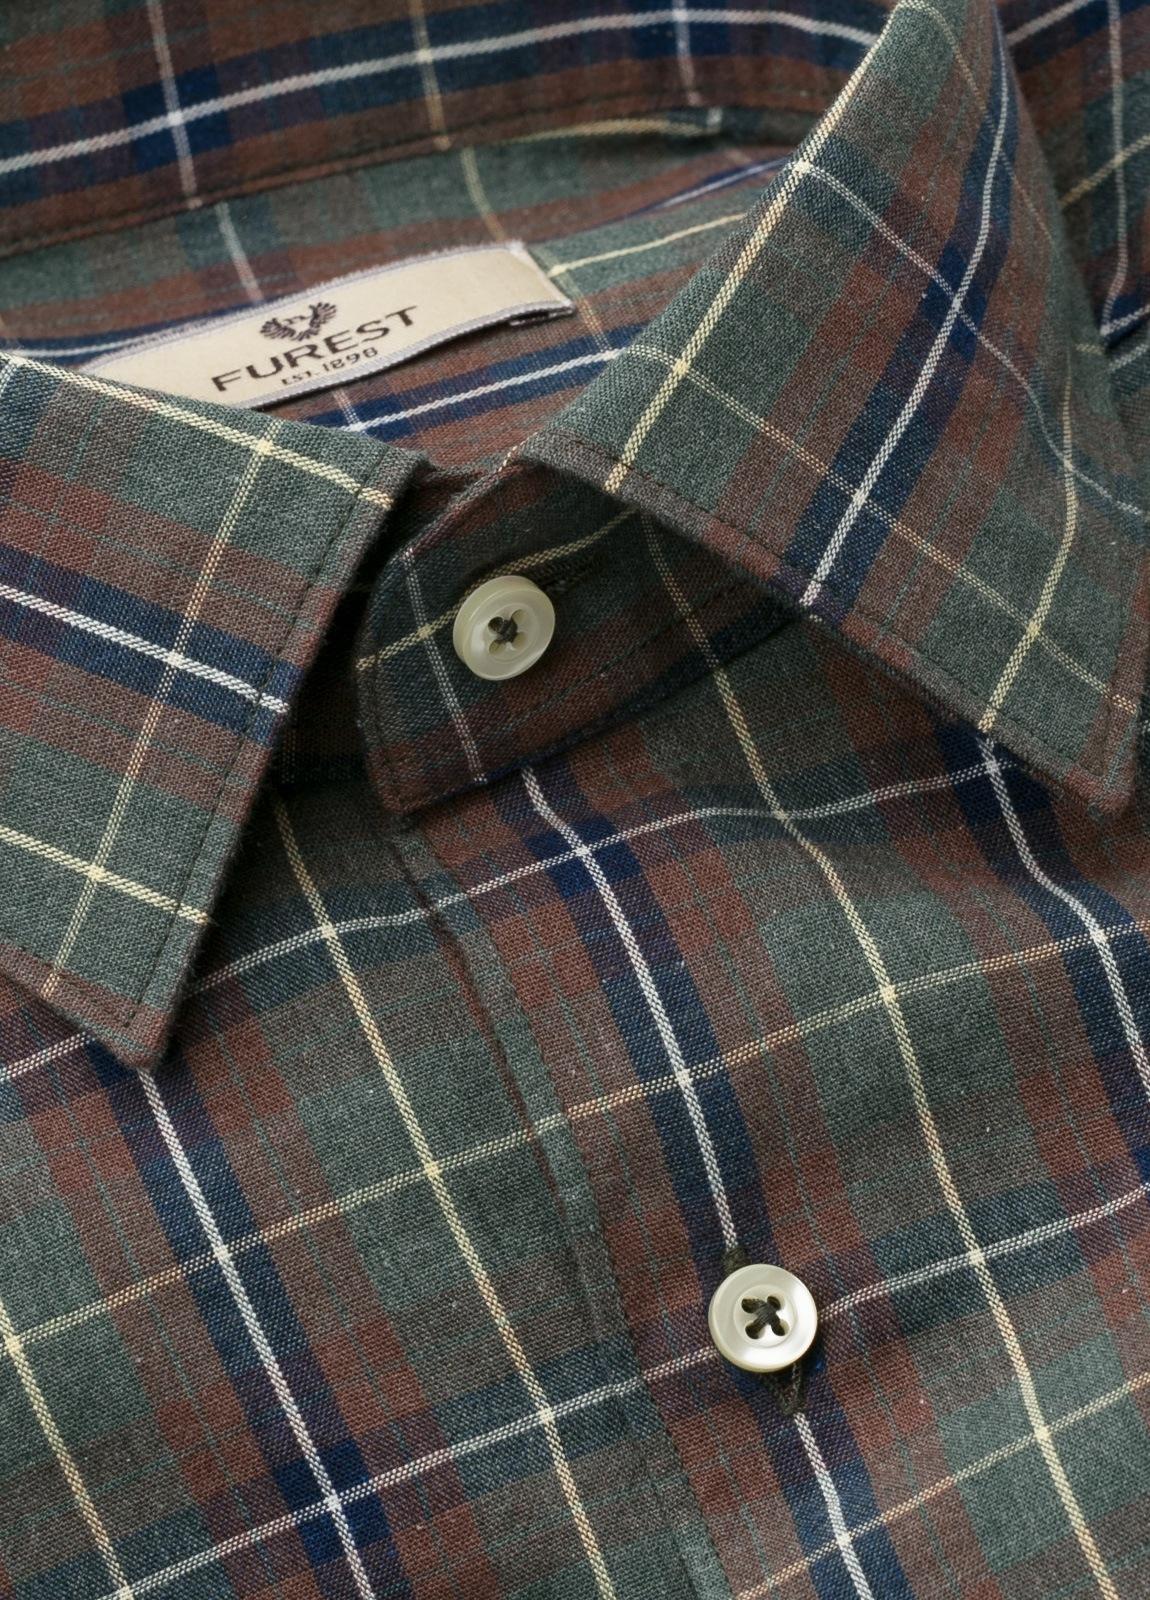 Camisa Leisure Wear REGULAR FIT modelo PORTO, cuadros gris, teja. 100% Algodón. - Ítem4